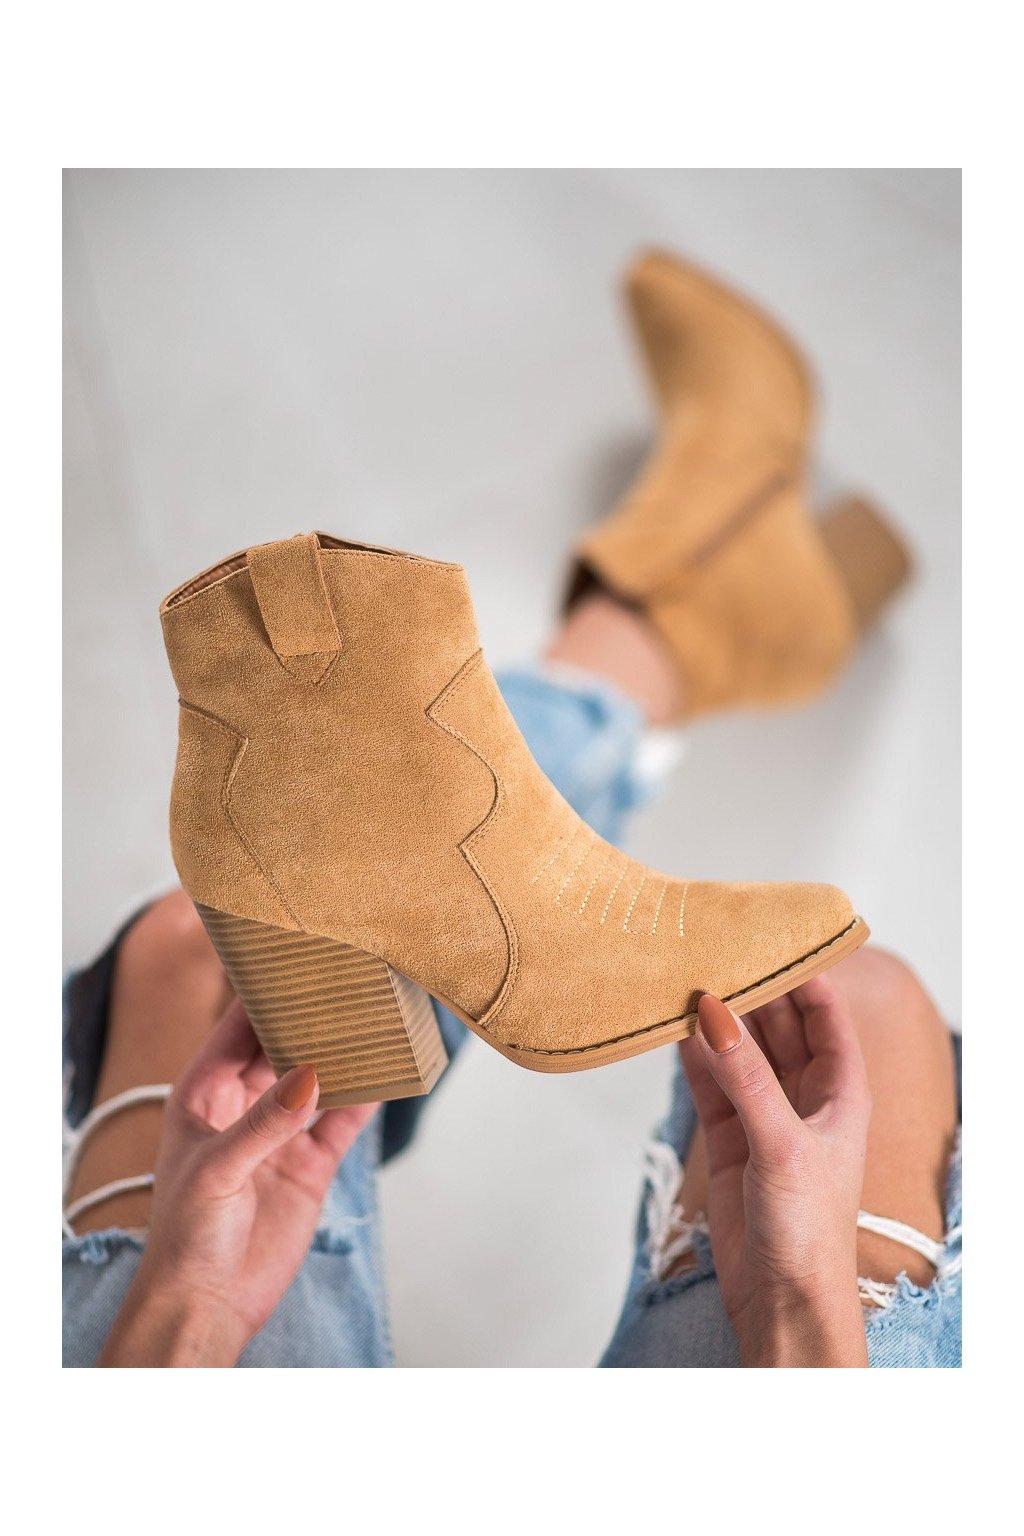 Hnedé dámske topánky Bella paris kod A5602C